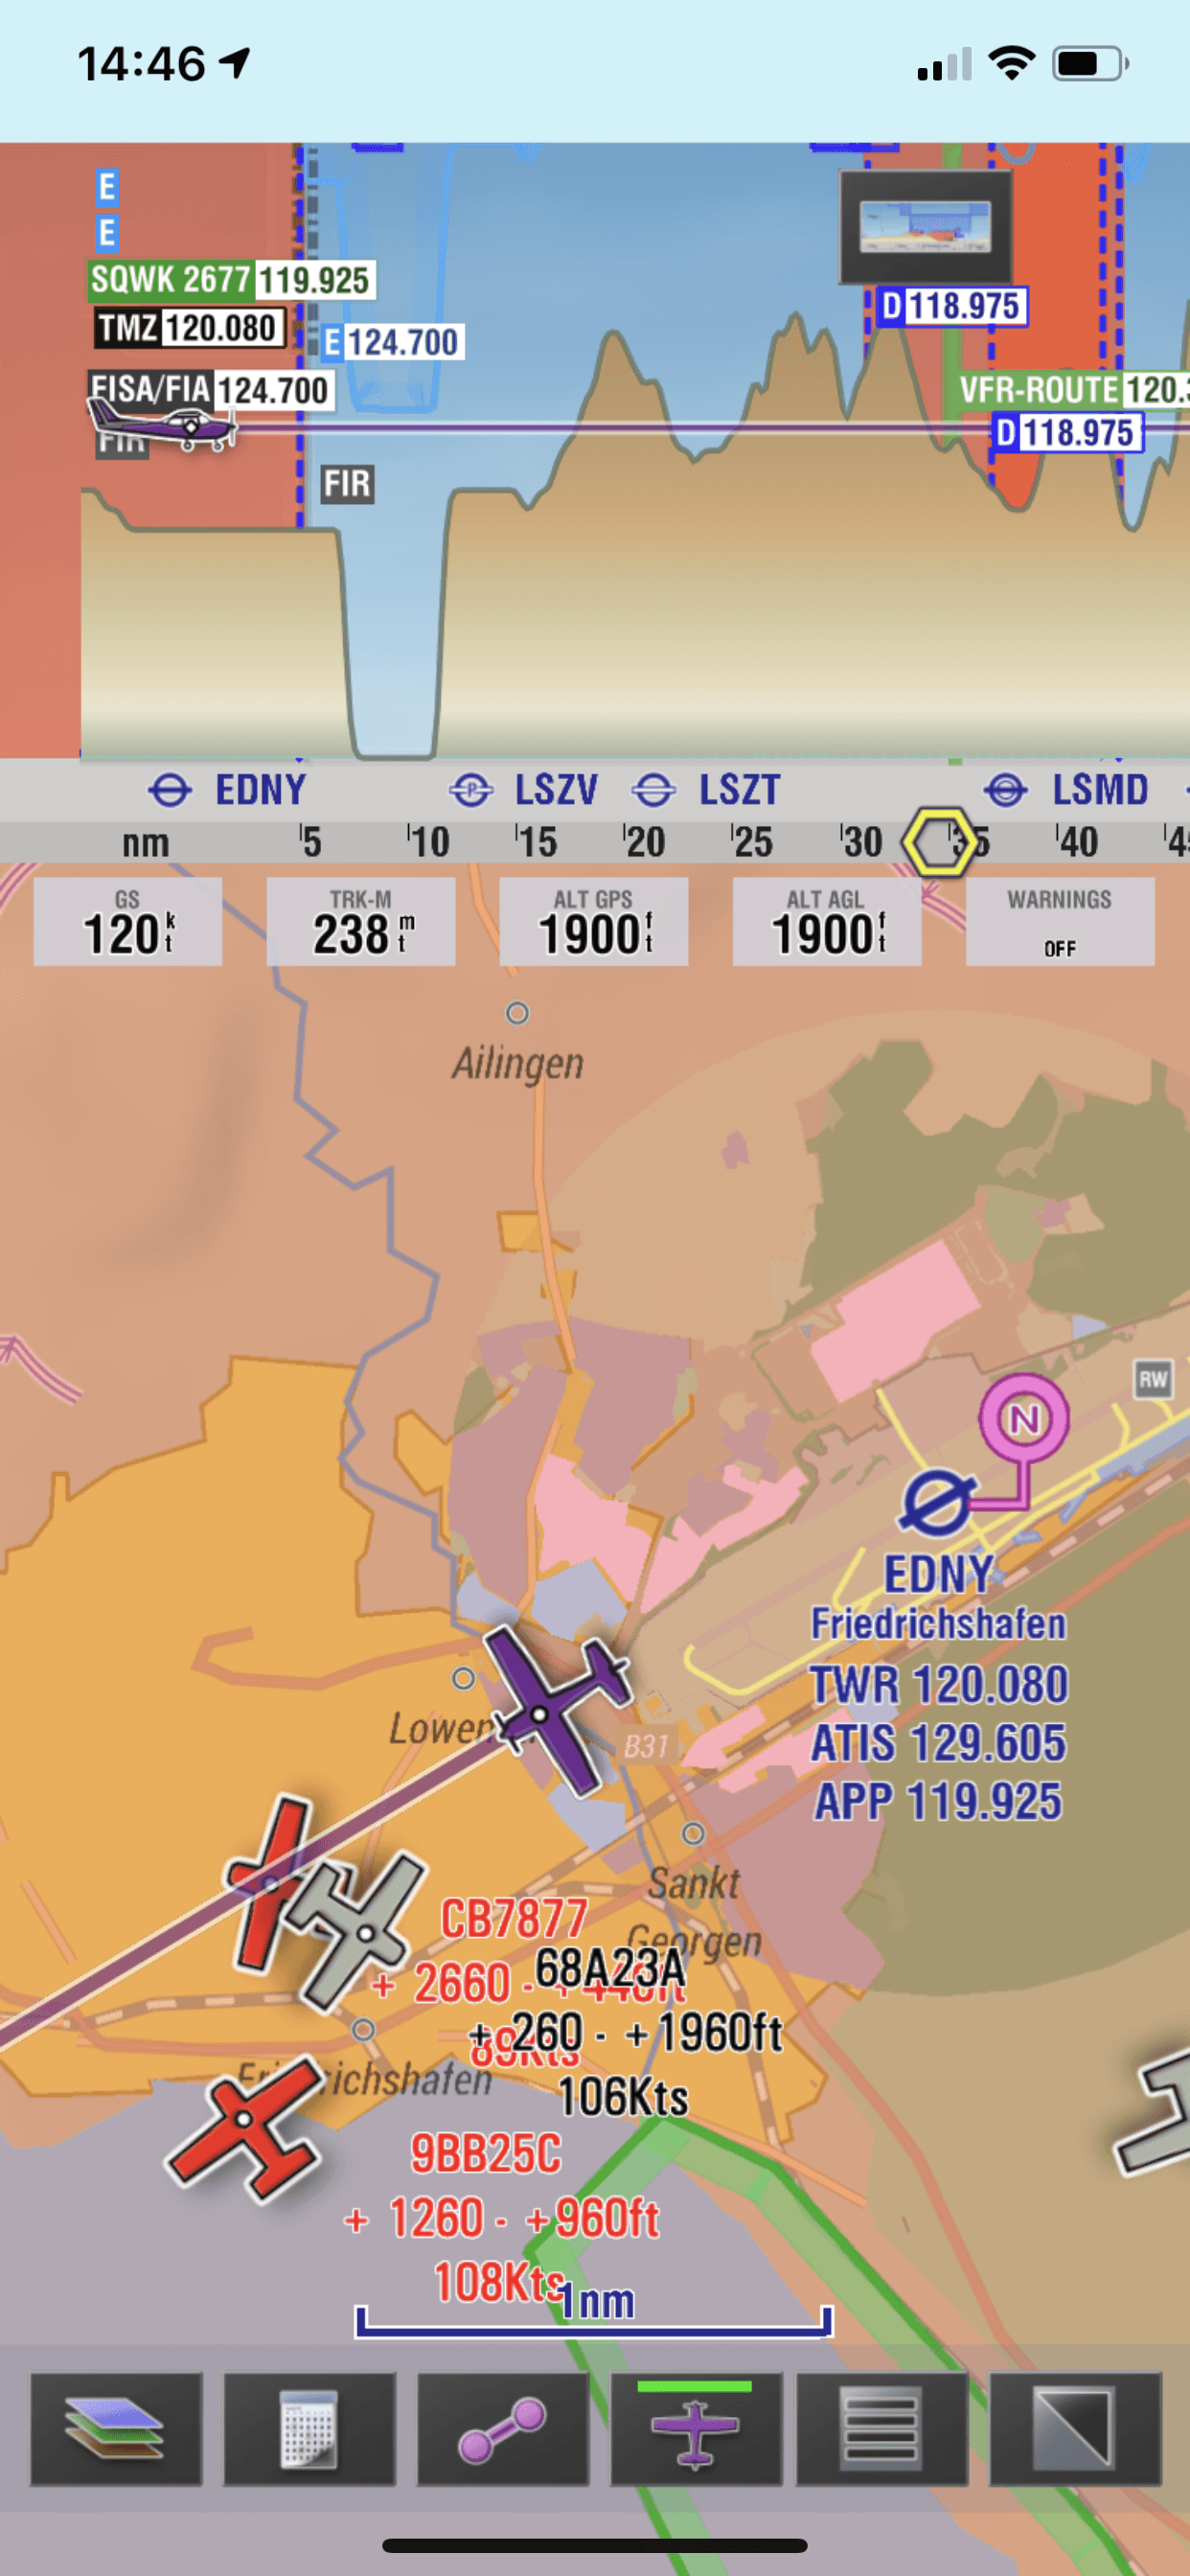 EasyVFR4 - Flugnavigation App